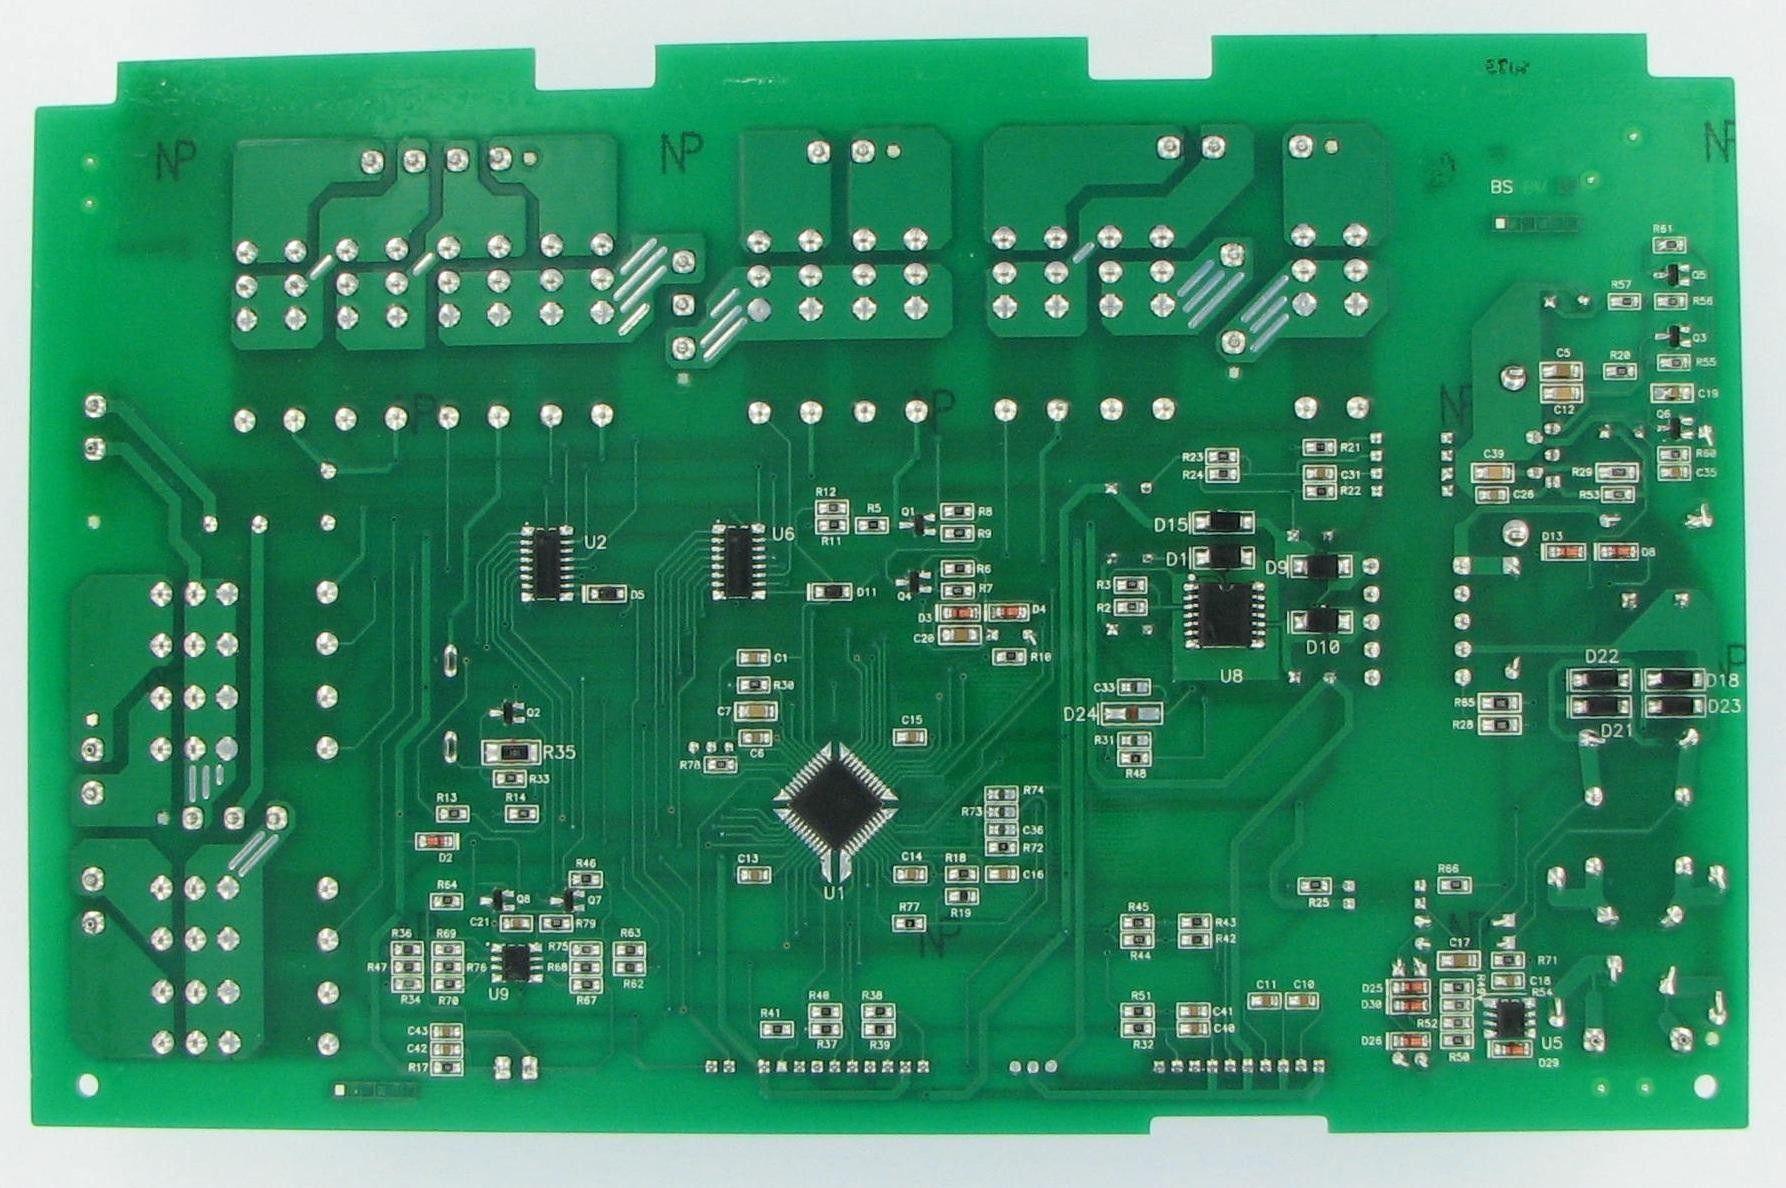 #Maytag Oven / Range Control Board Repair Service #8507P20060